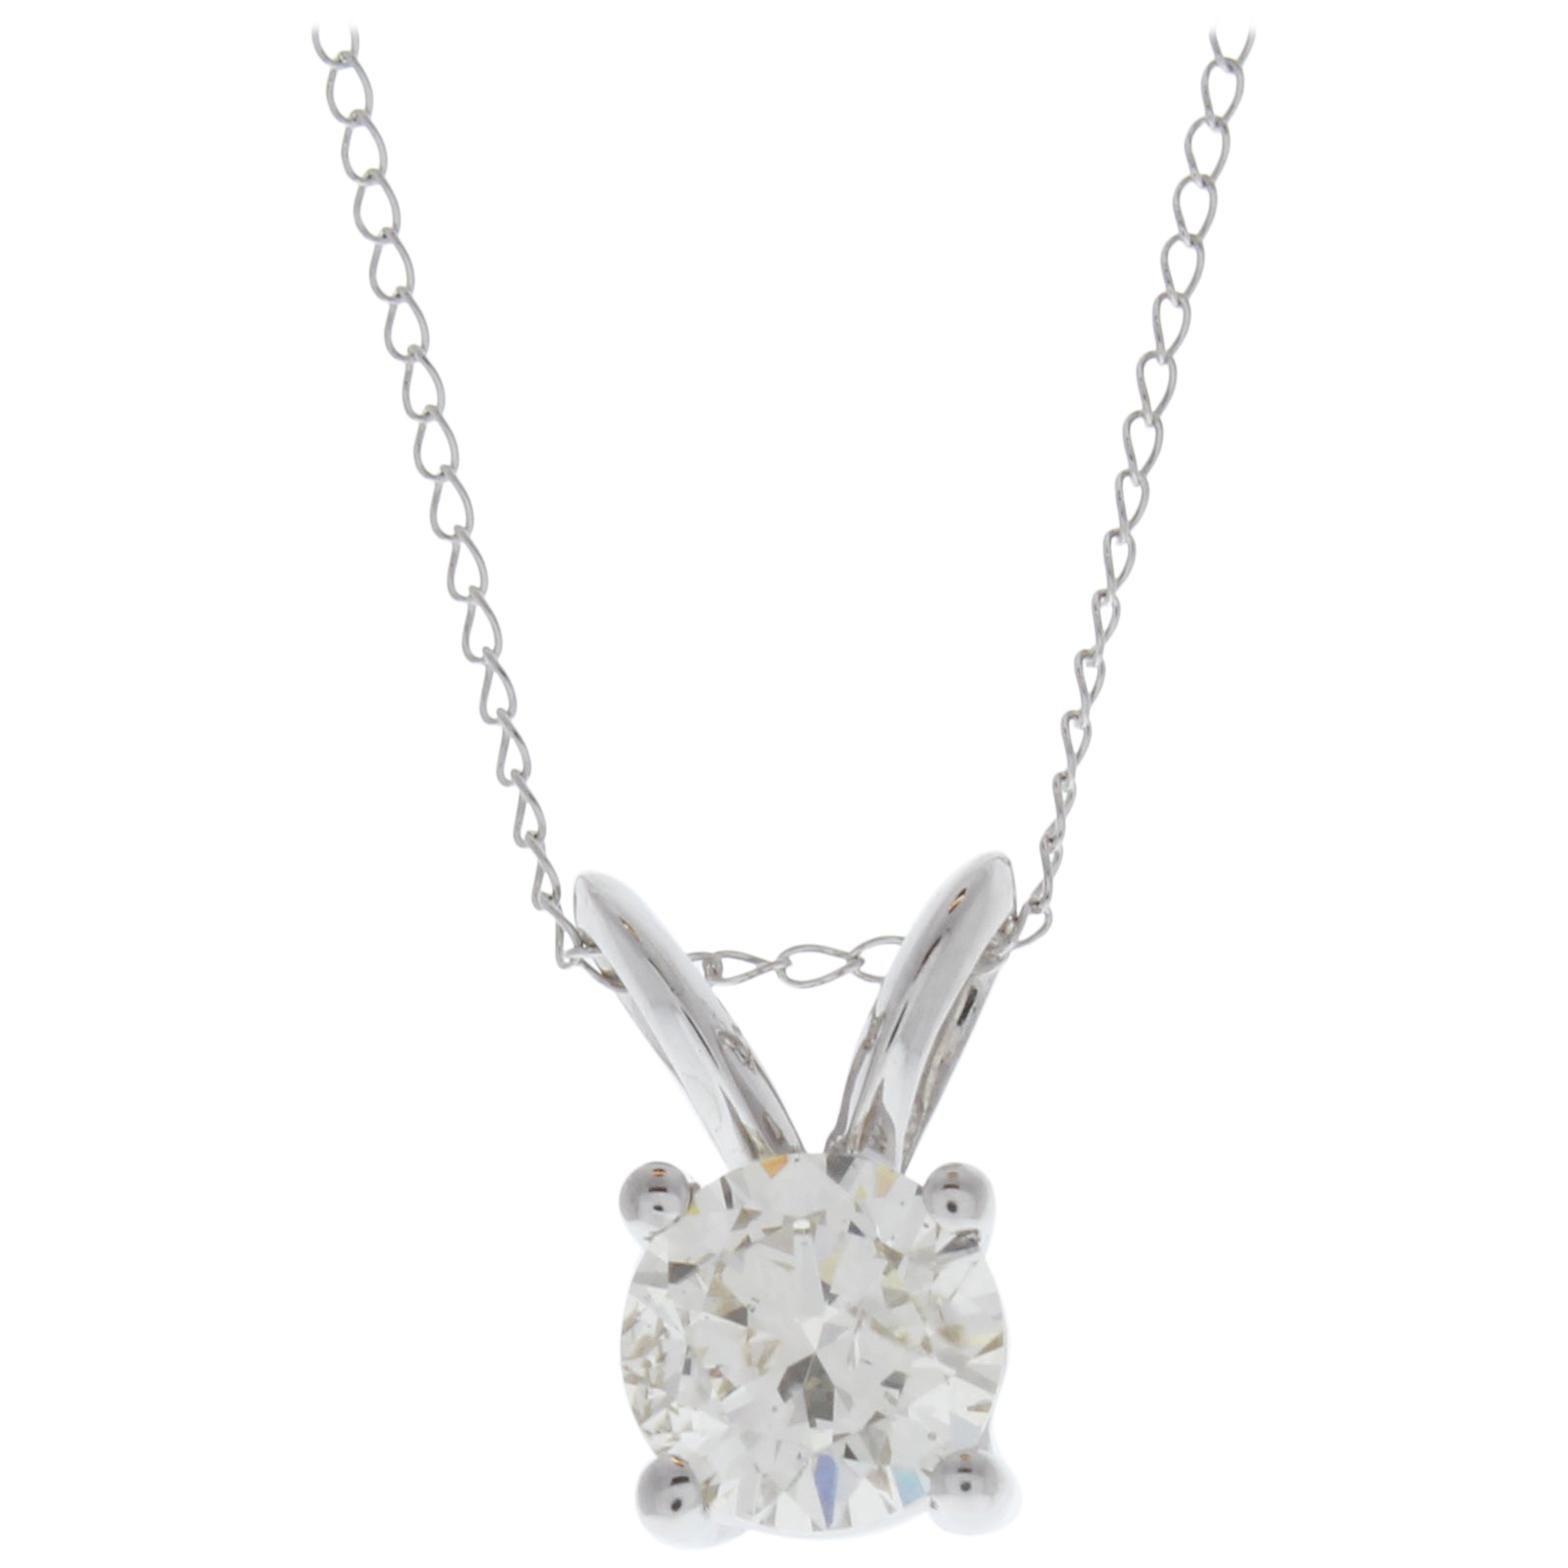 1.00 Carat Round Diamond Solitaire Pendant in 14 Karat White Gold